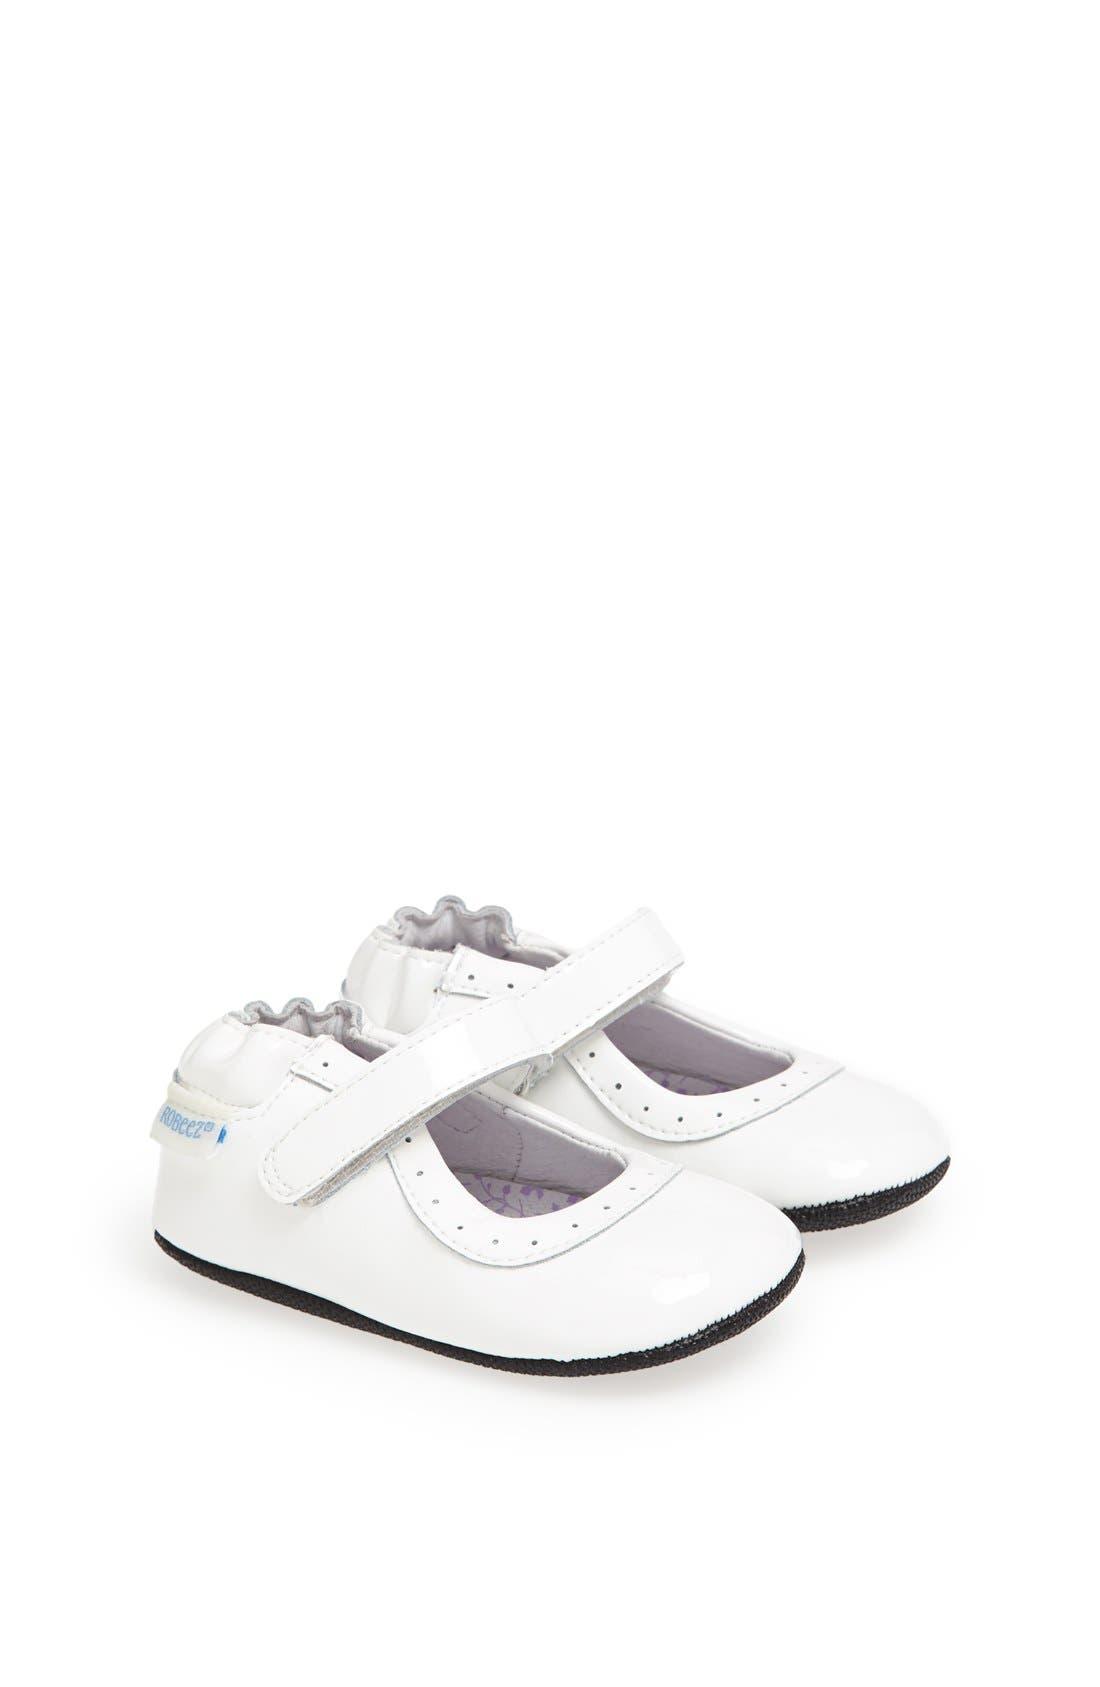 Main Image - Robeez® 'Mini Shoez - Gracie' Mary Jane (Baby & Walker)